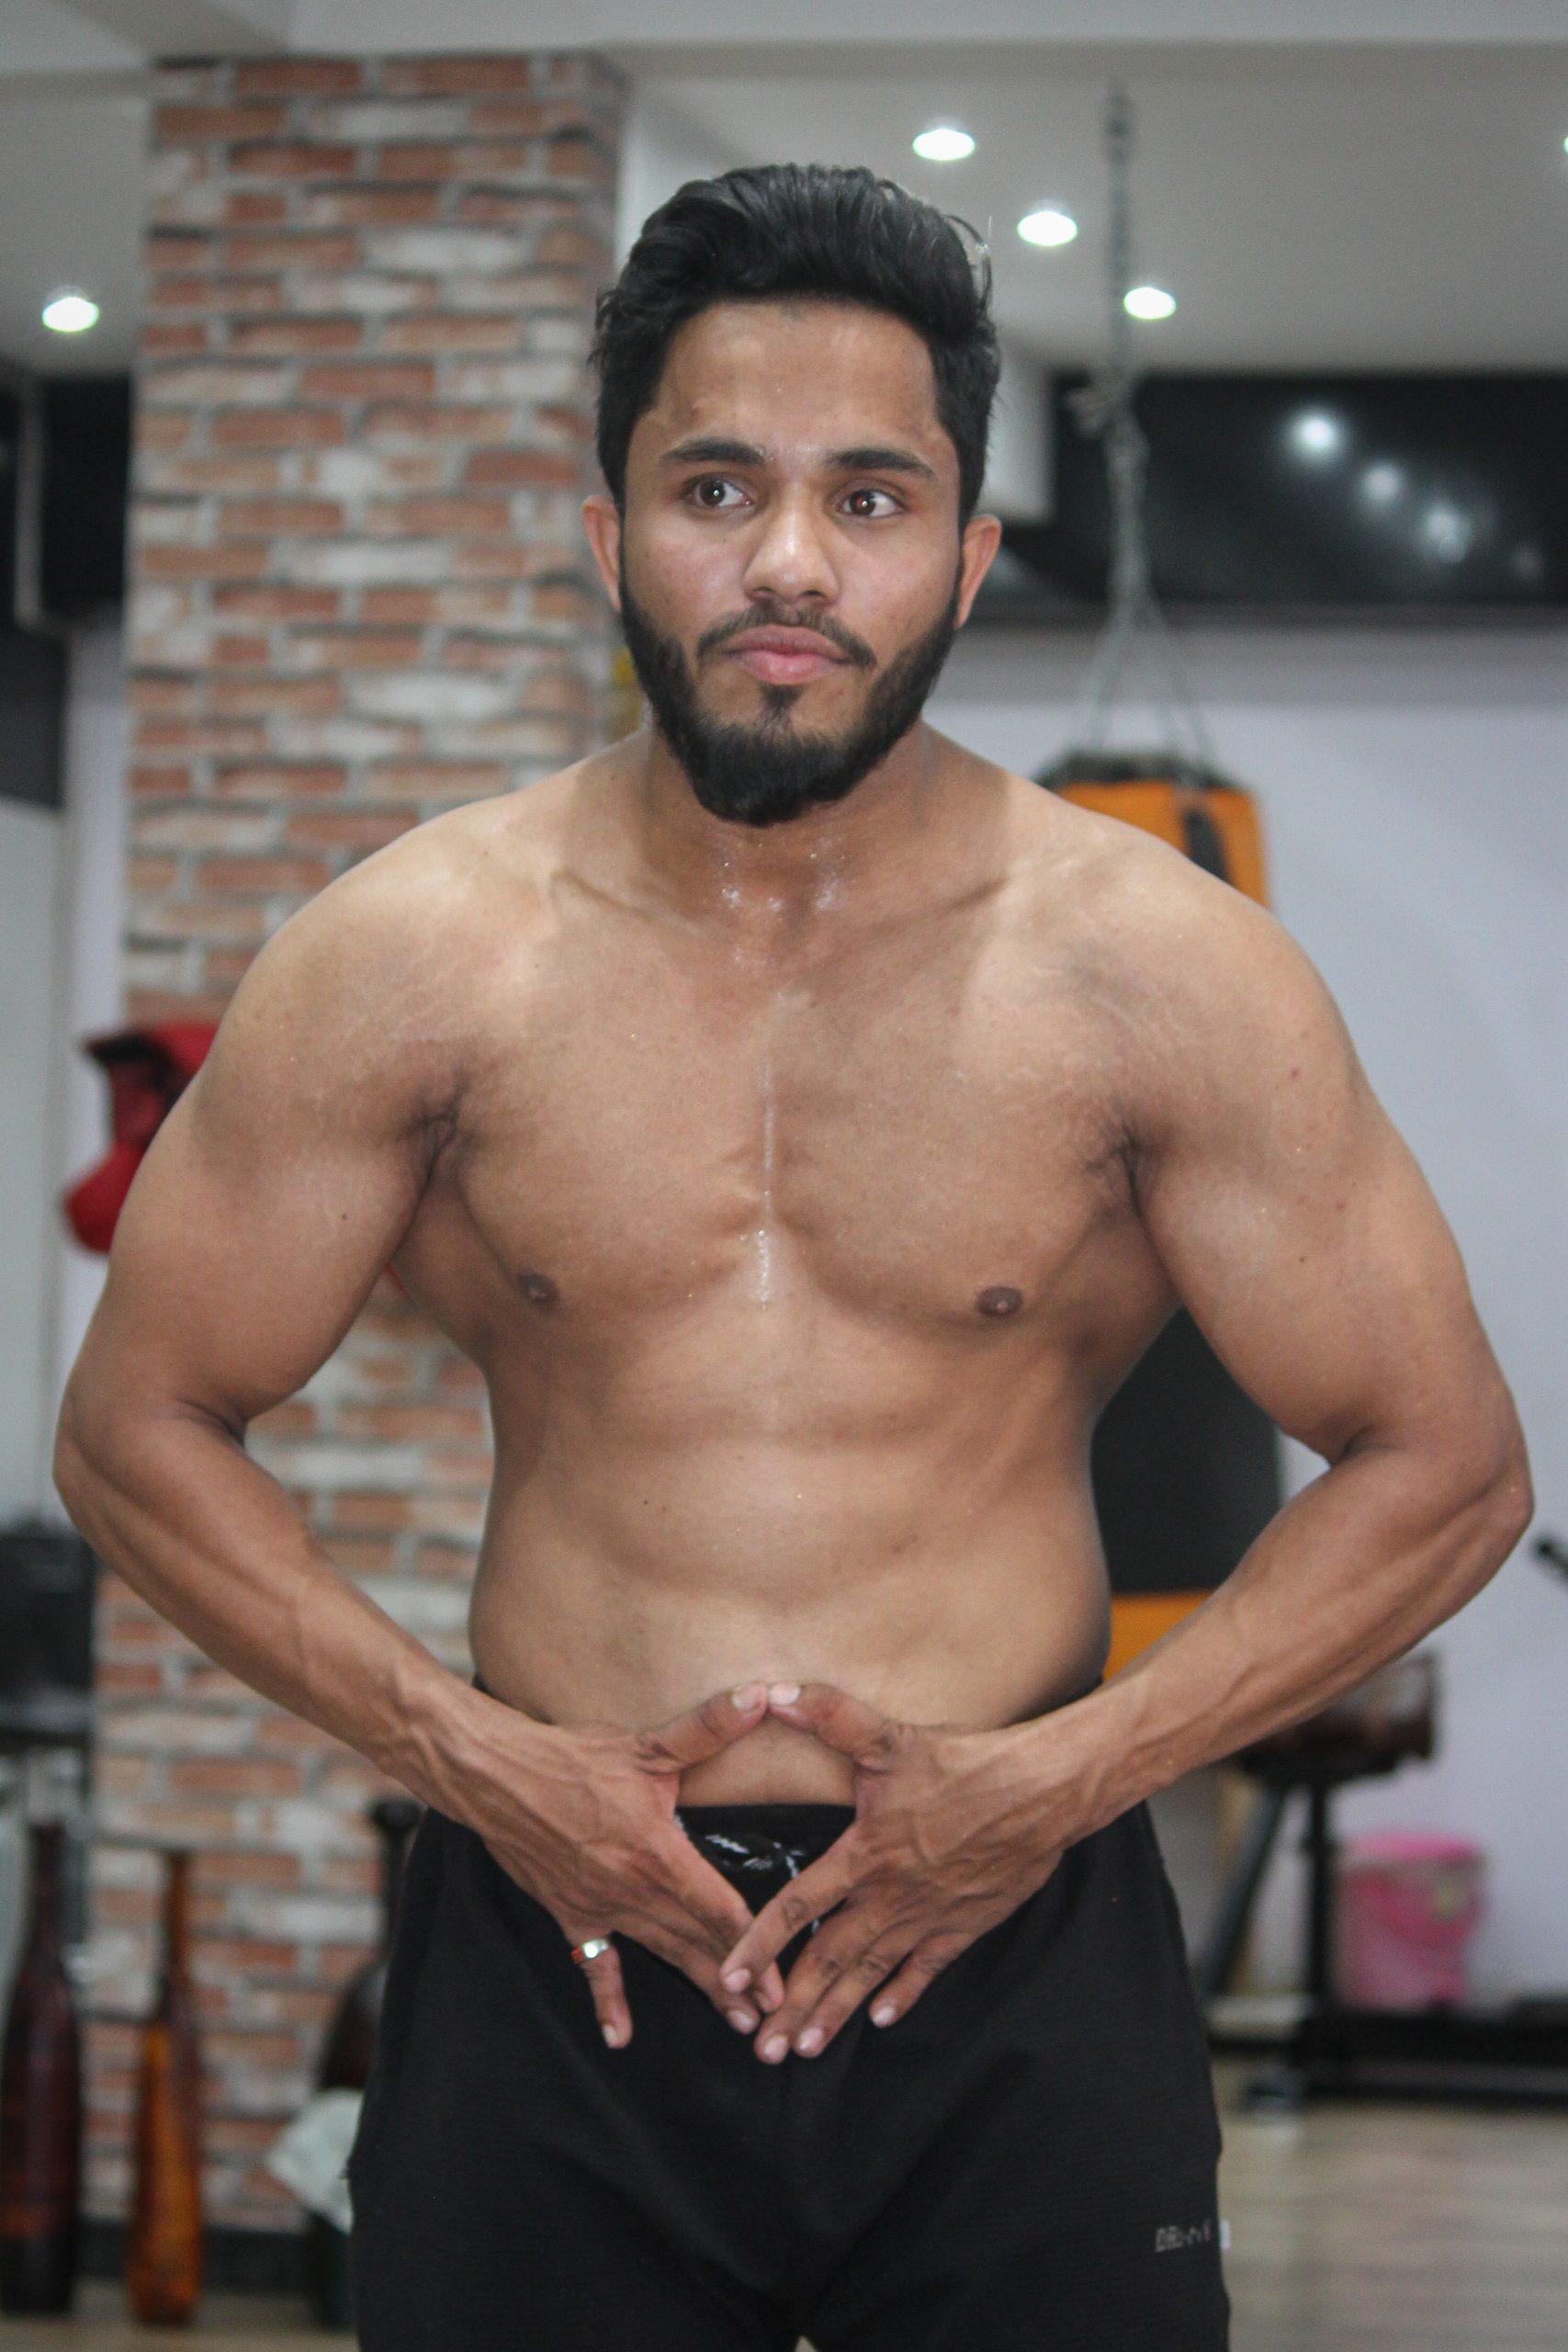 Gym model posing